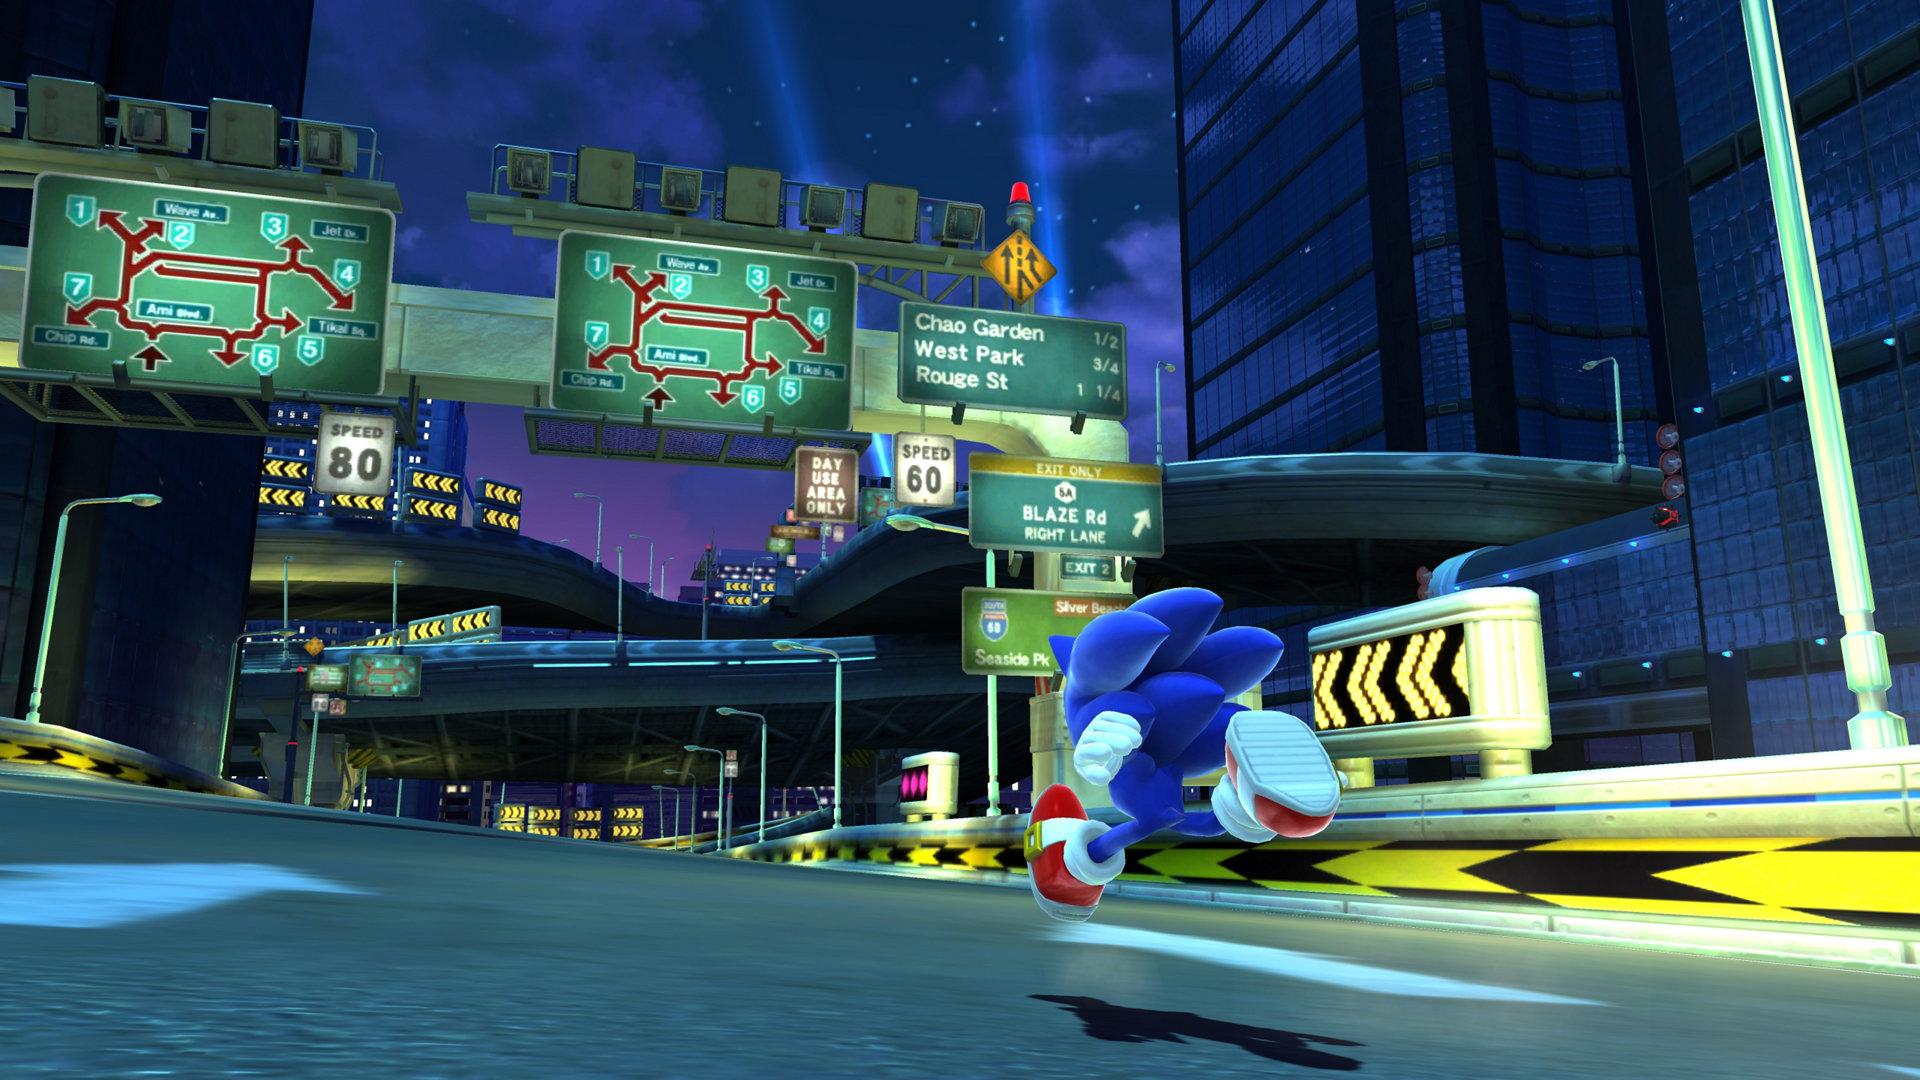 File:Sonicspeedhighway3.jpg